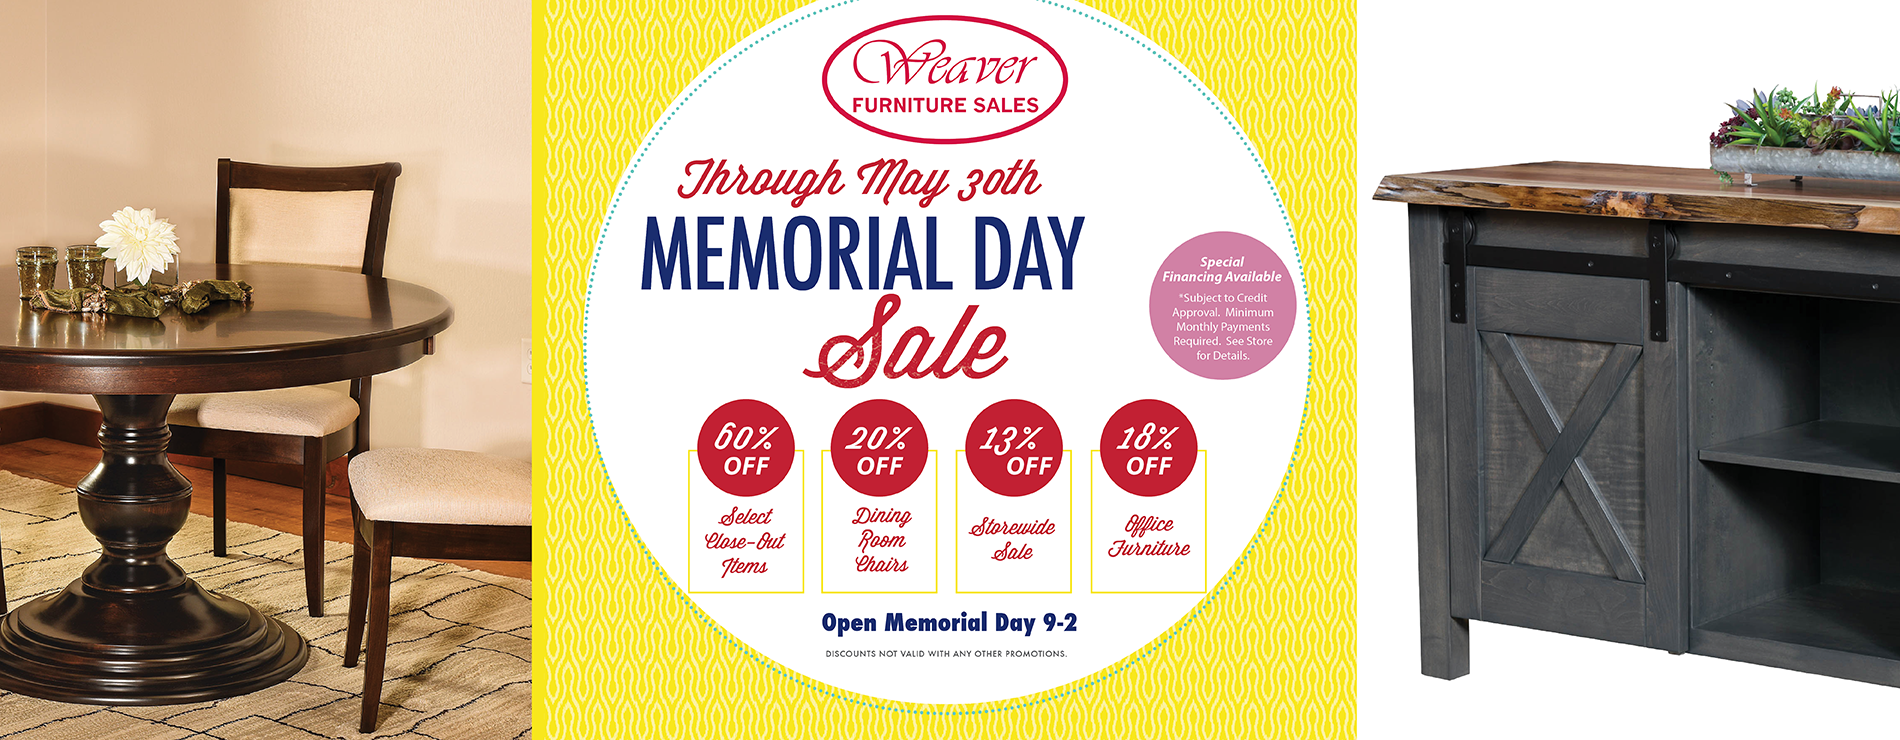 Weaver Memorial Day Furniture Sale Details